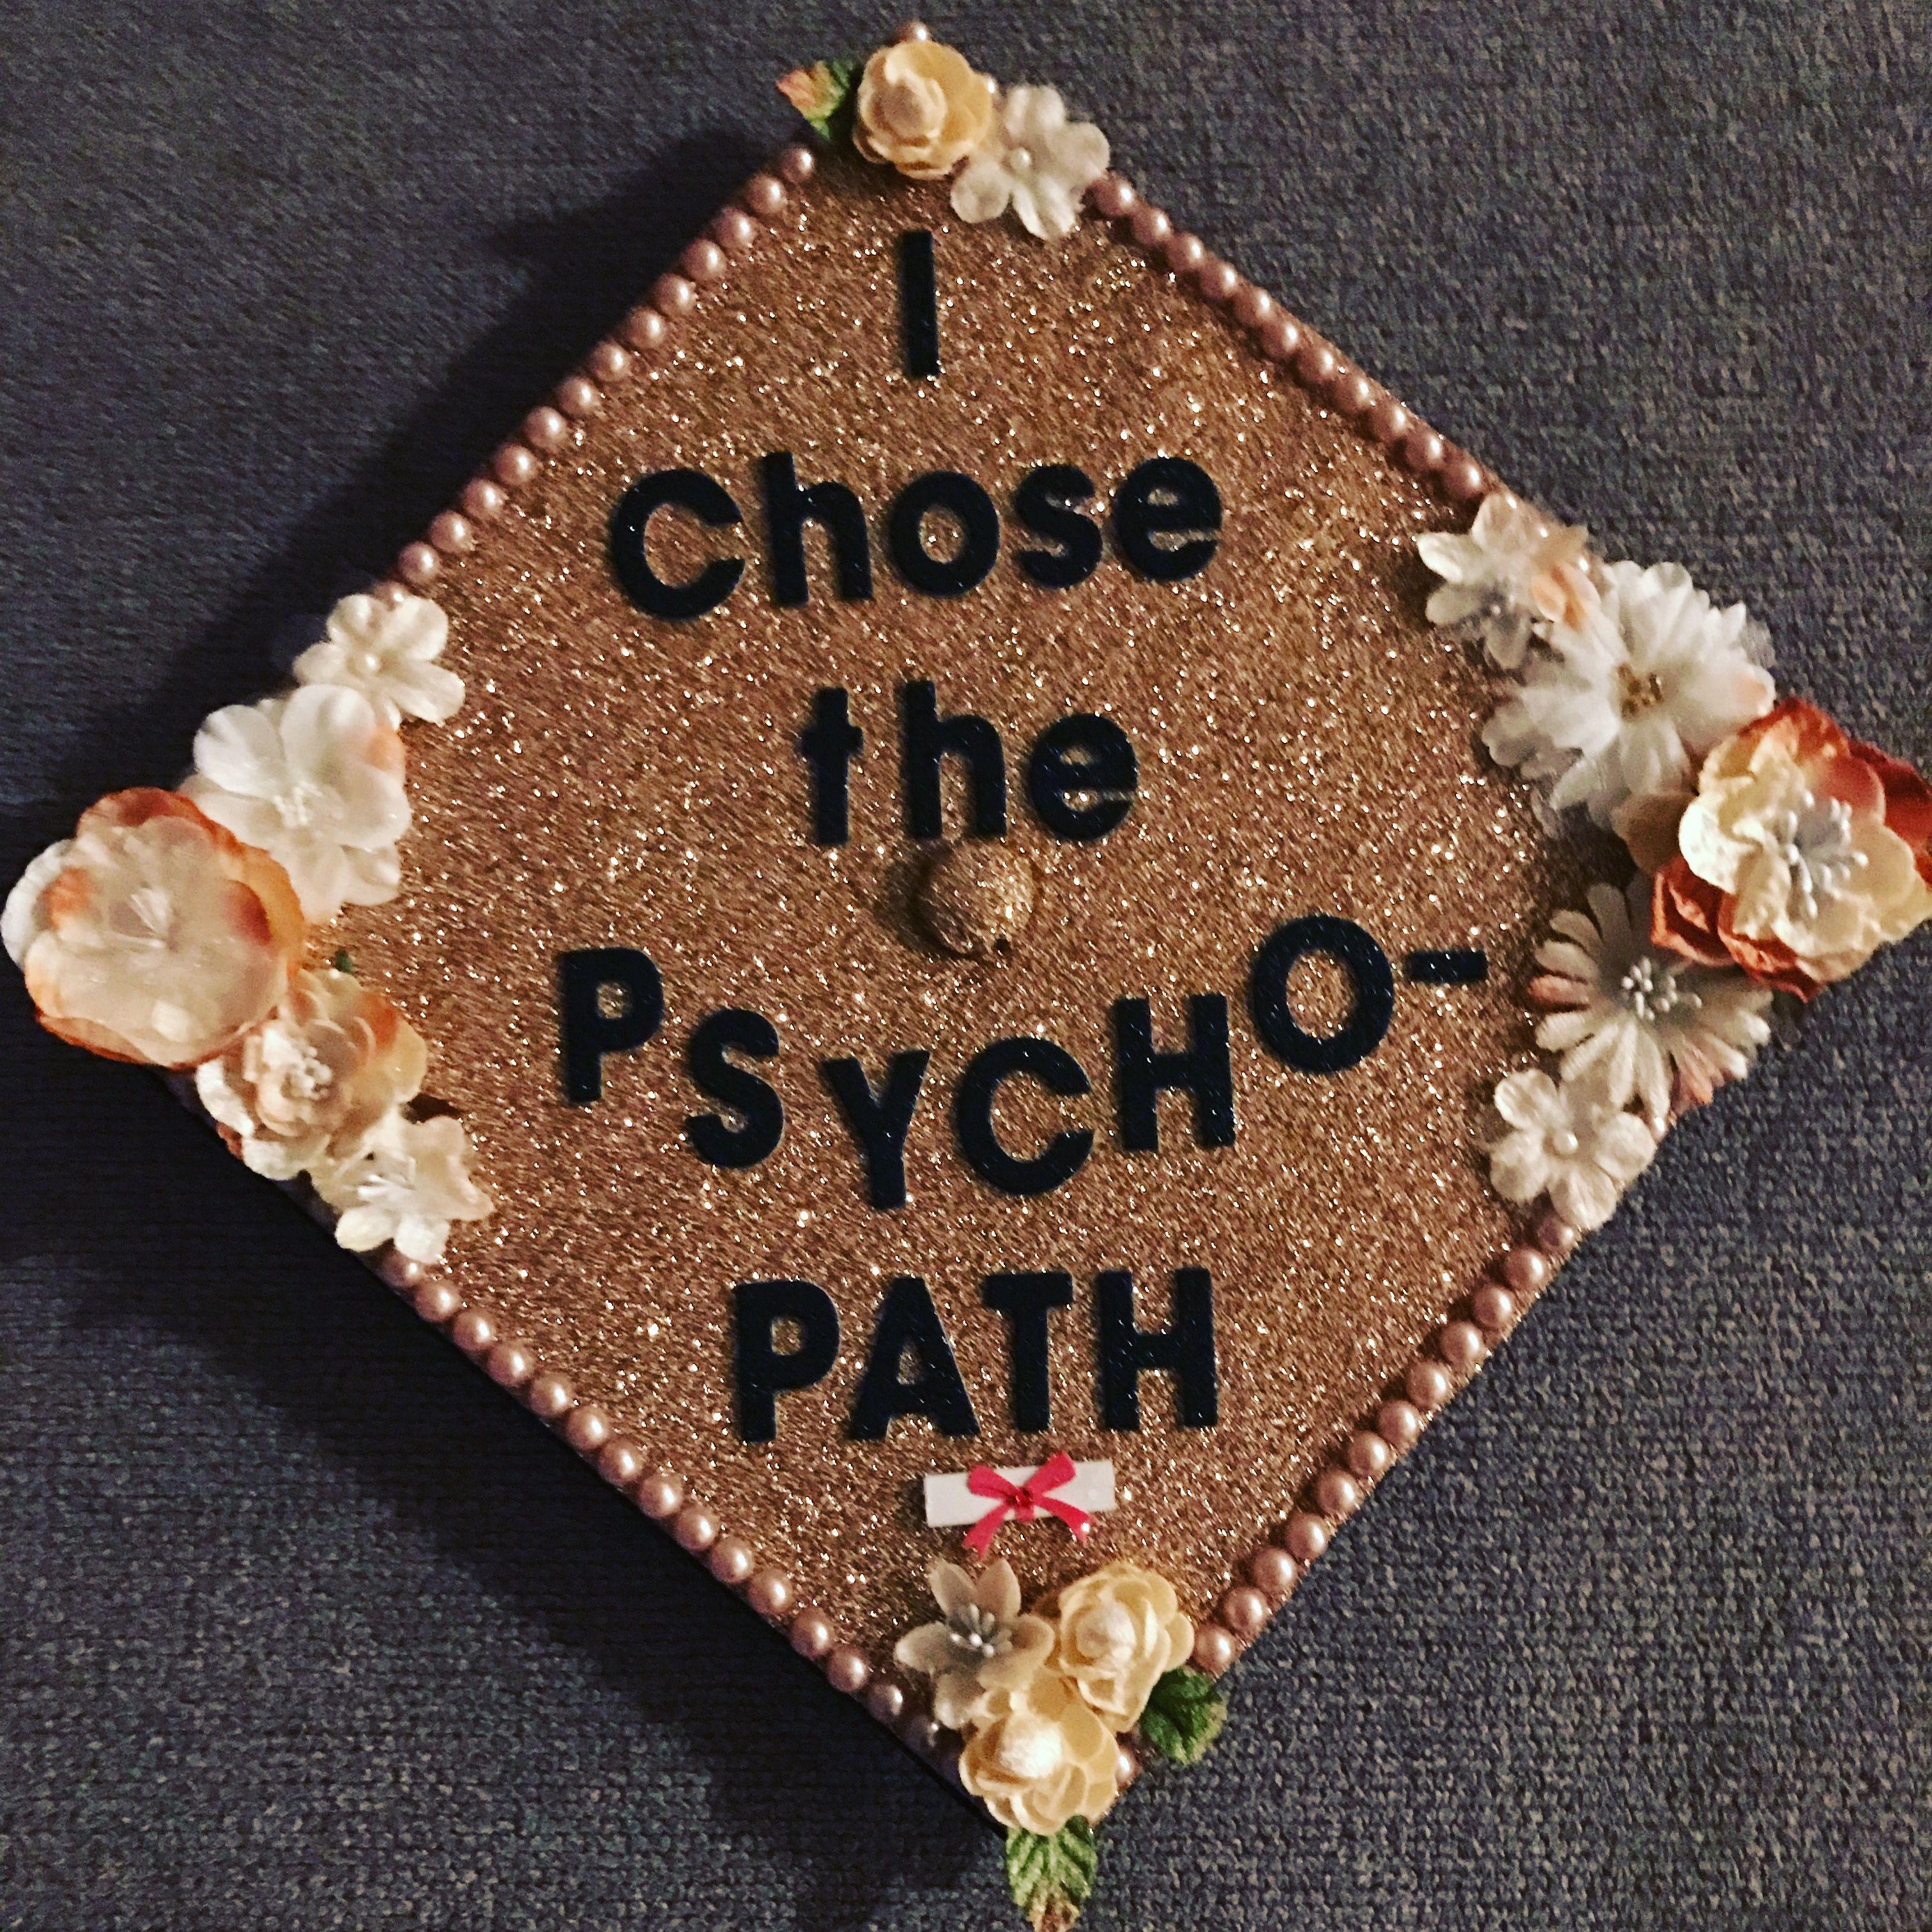 Decorating graduation cap ideas for teachers - My Graduation Cap Psychology